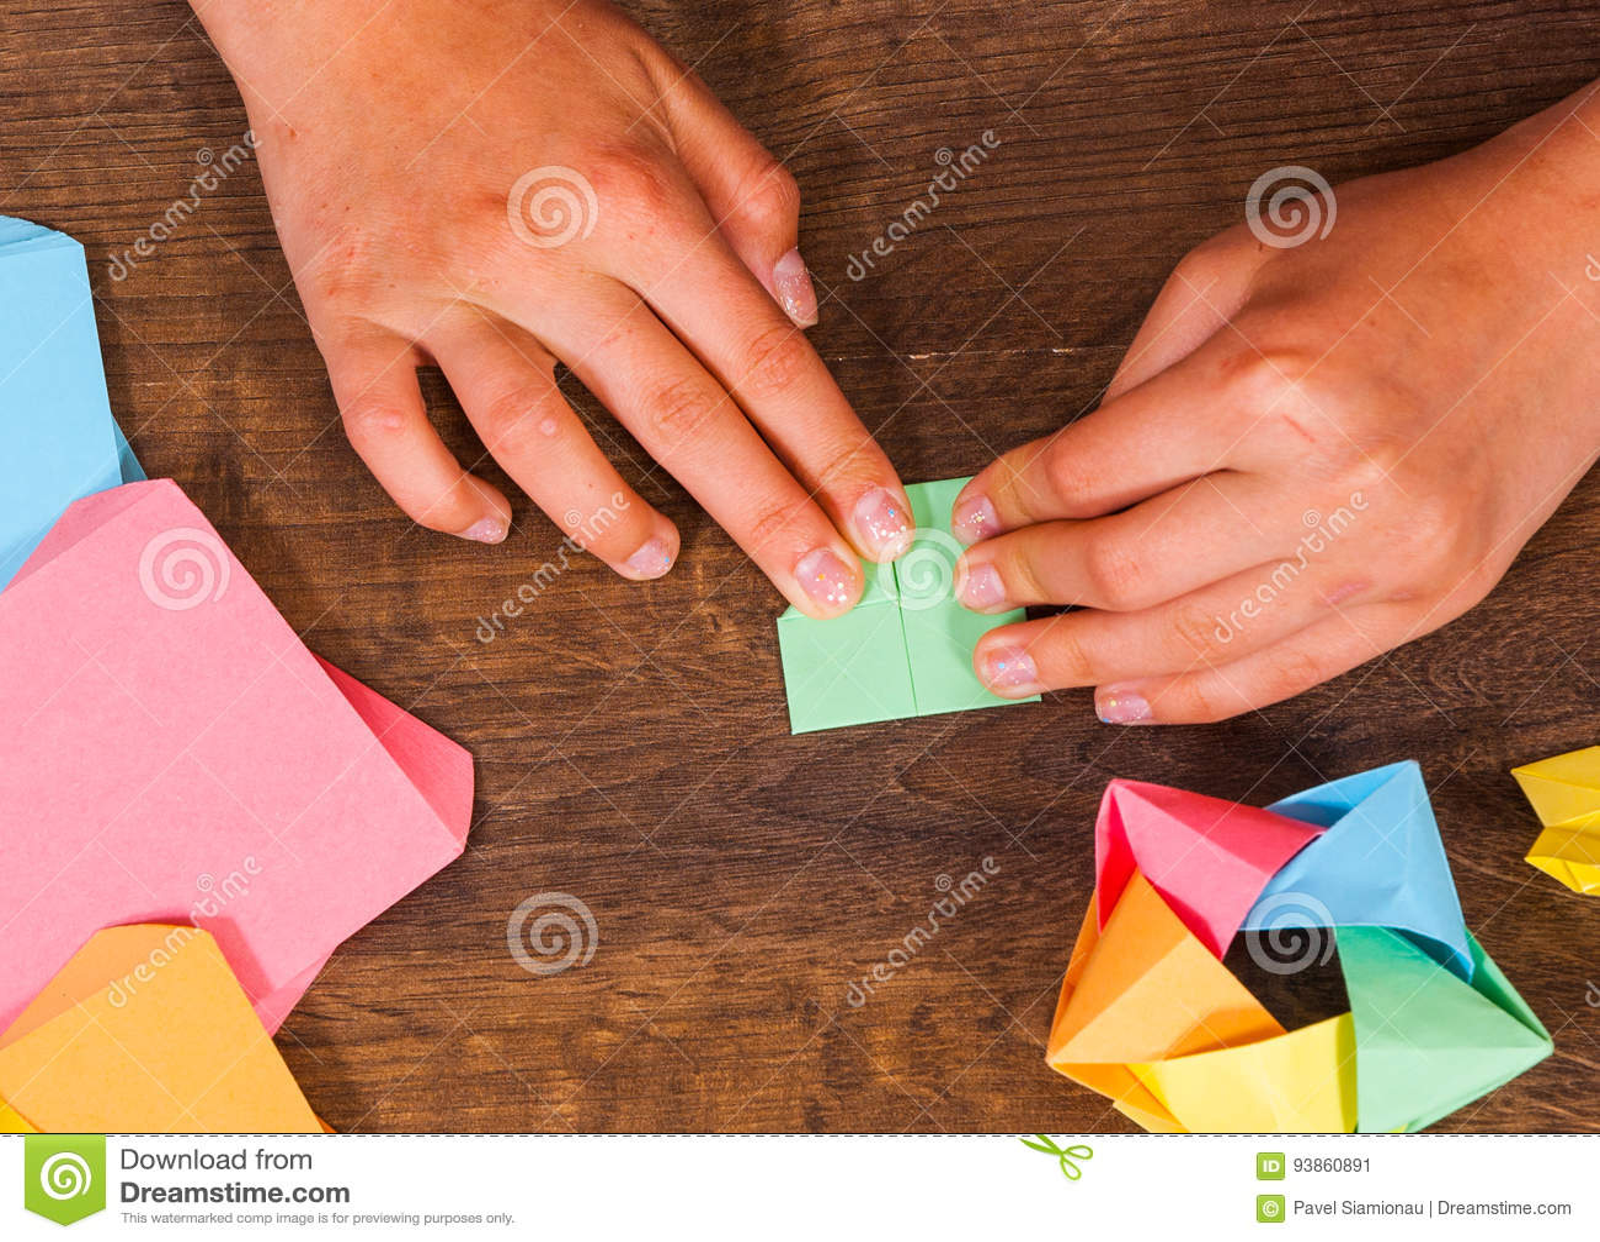 Child Puts The Modules Children S Creativity Made Of Paper Origami